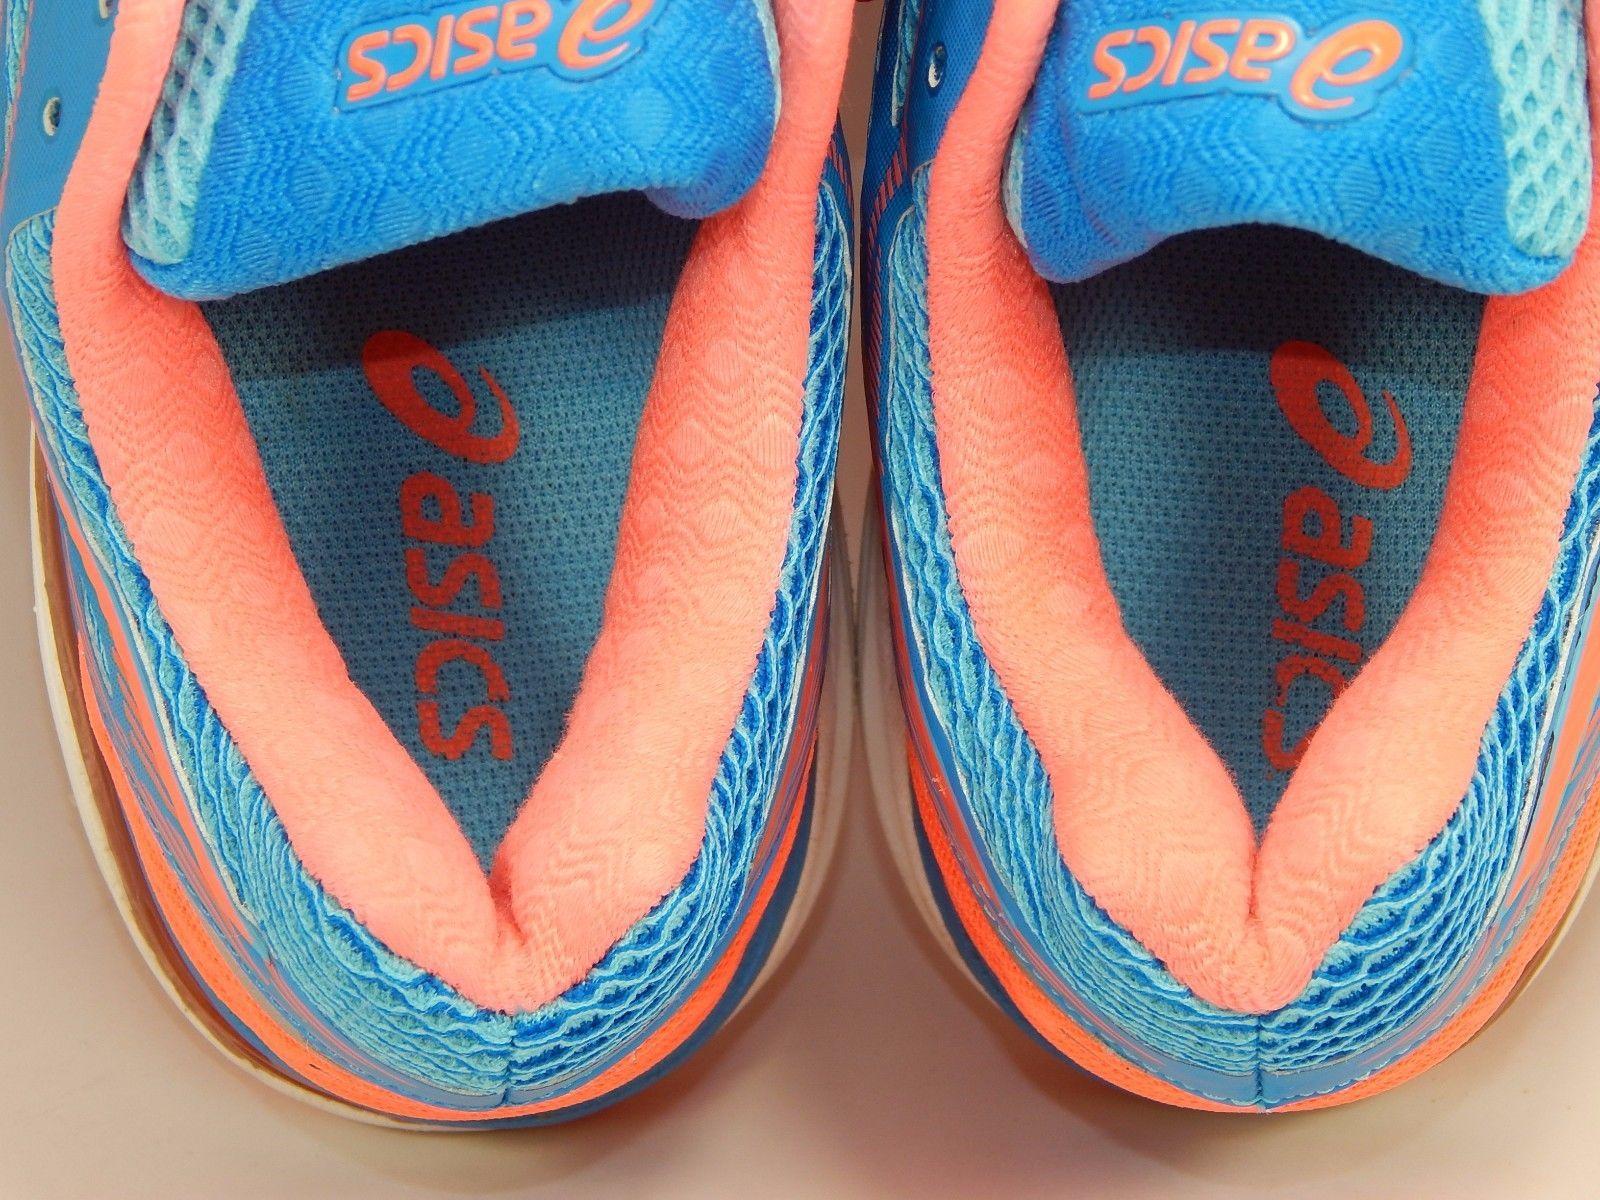 Asics Gel Cumulus 18 Women's Running Shoes Size US 10.5 M (B) EU 42.5 Blue T6C8N